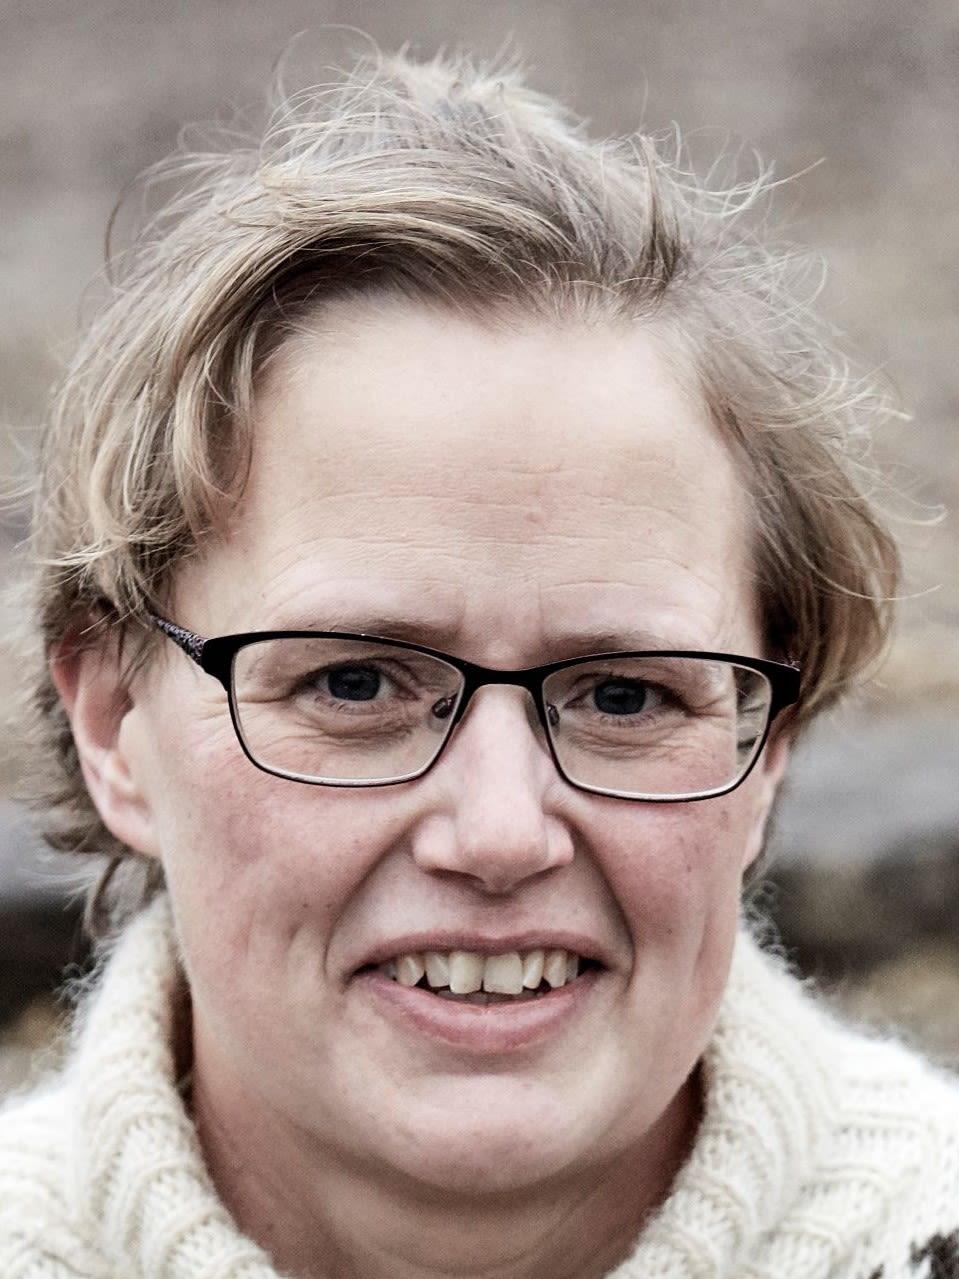 Annette Gravermedhjælper portrætfoto.jpg